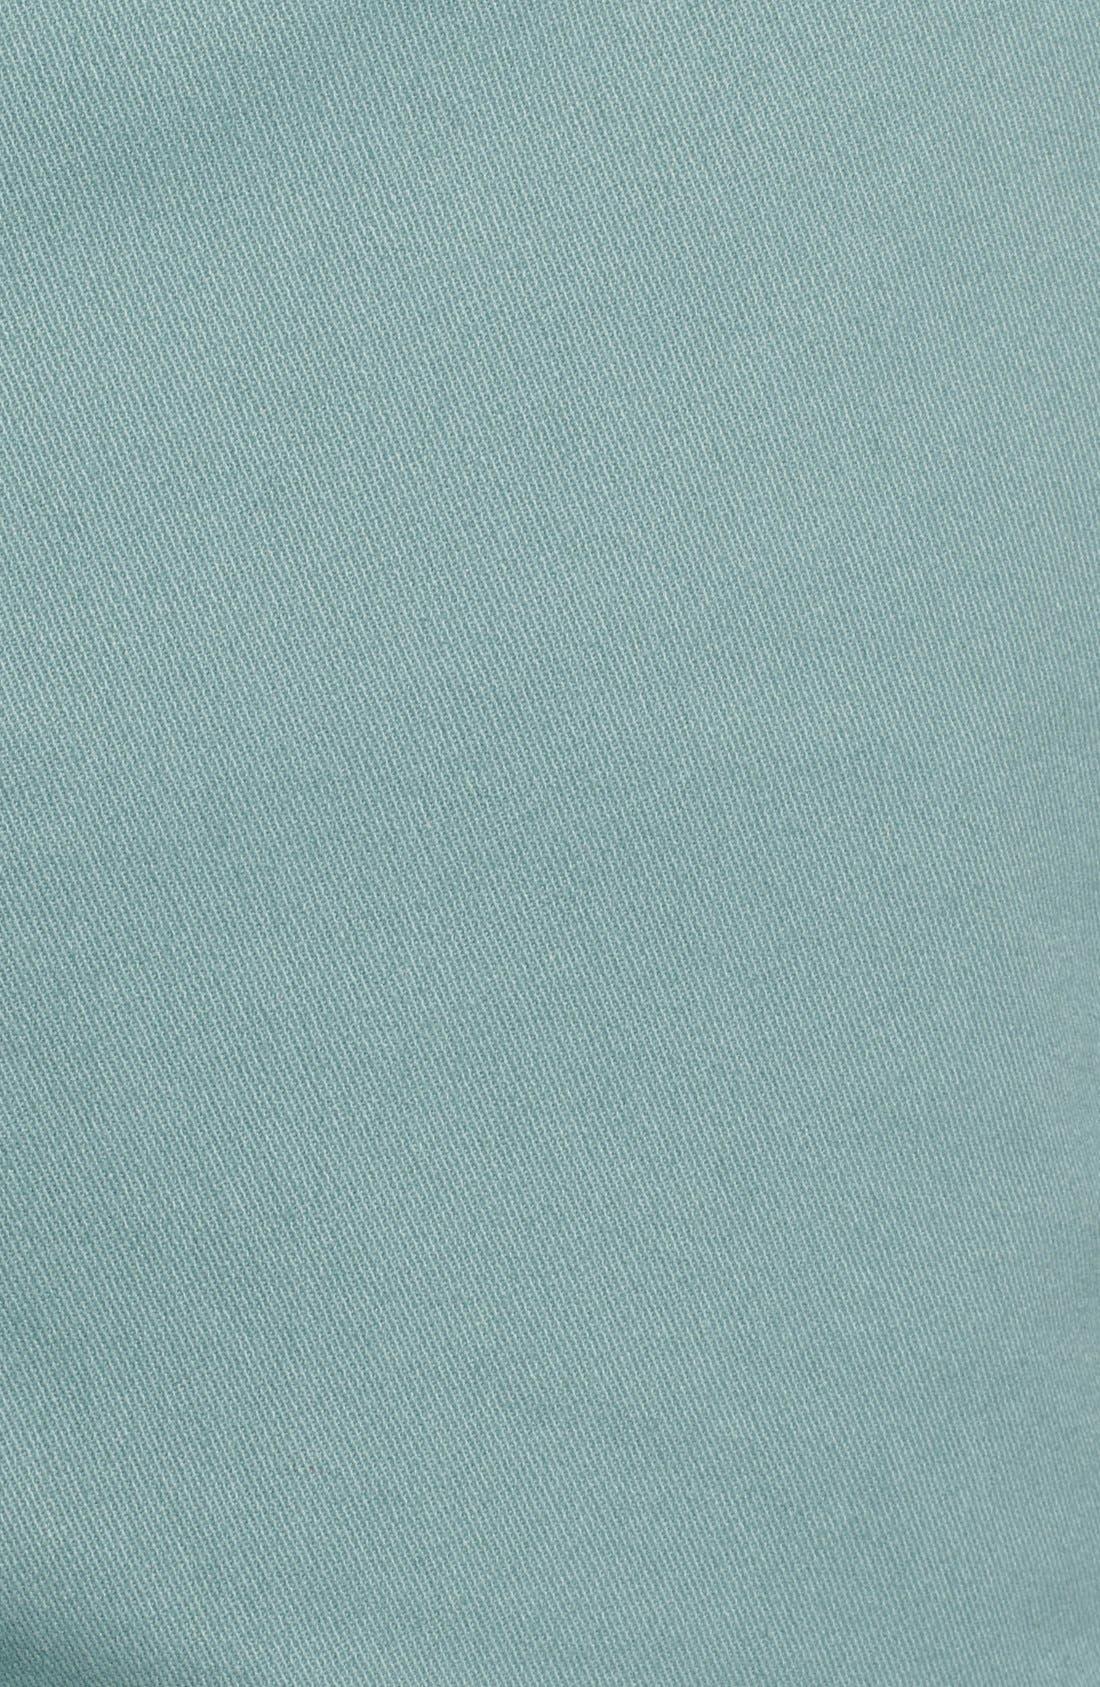 Alternate Image 3  - RVCA 'All Time' Cutoff Shorts